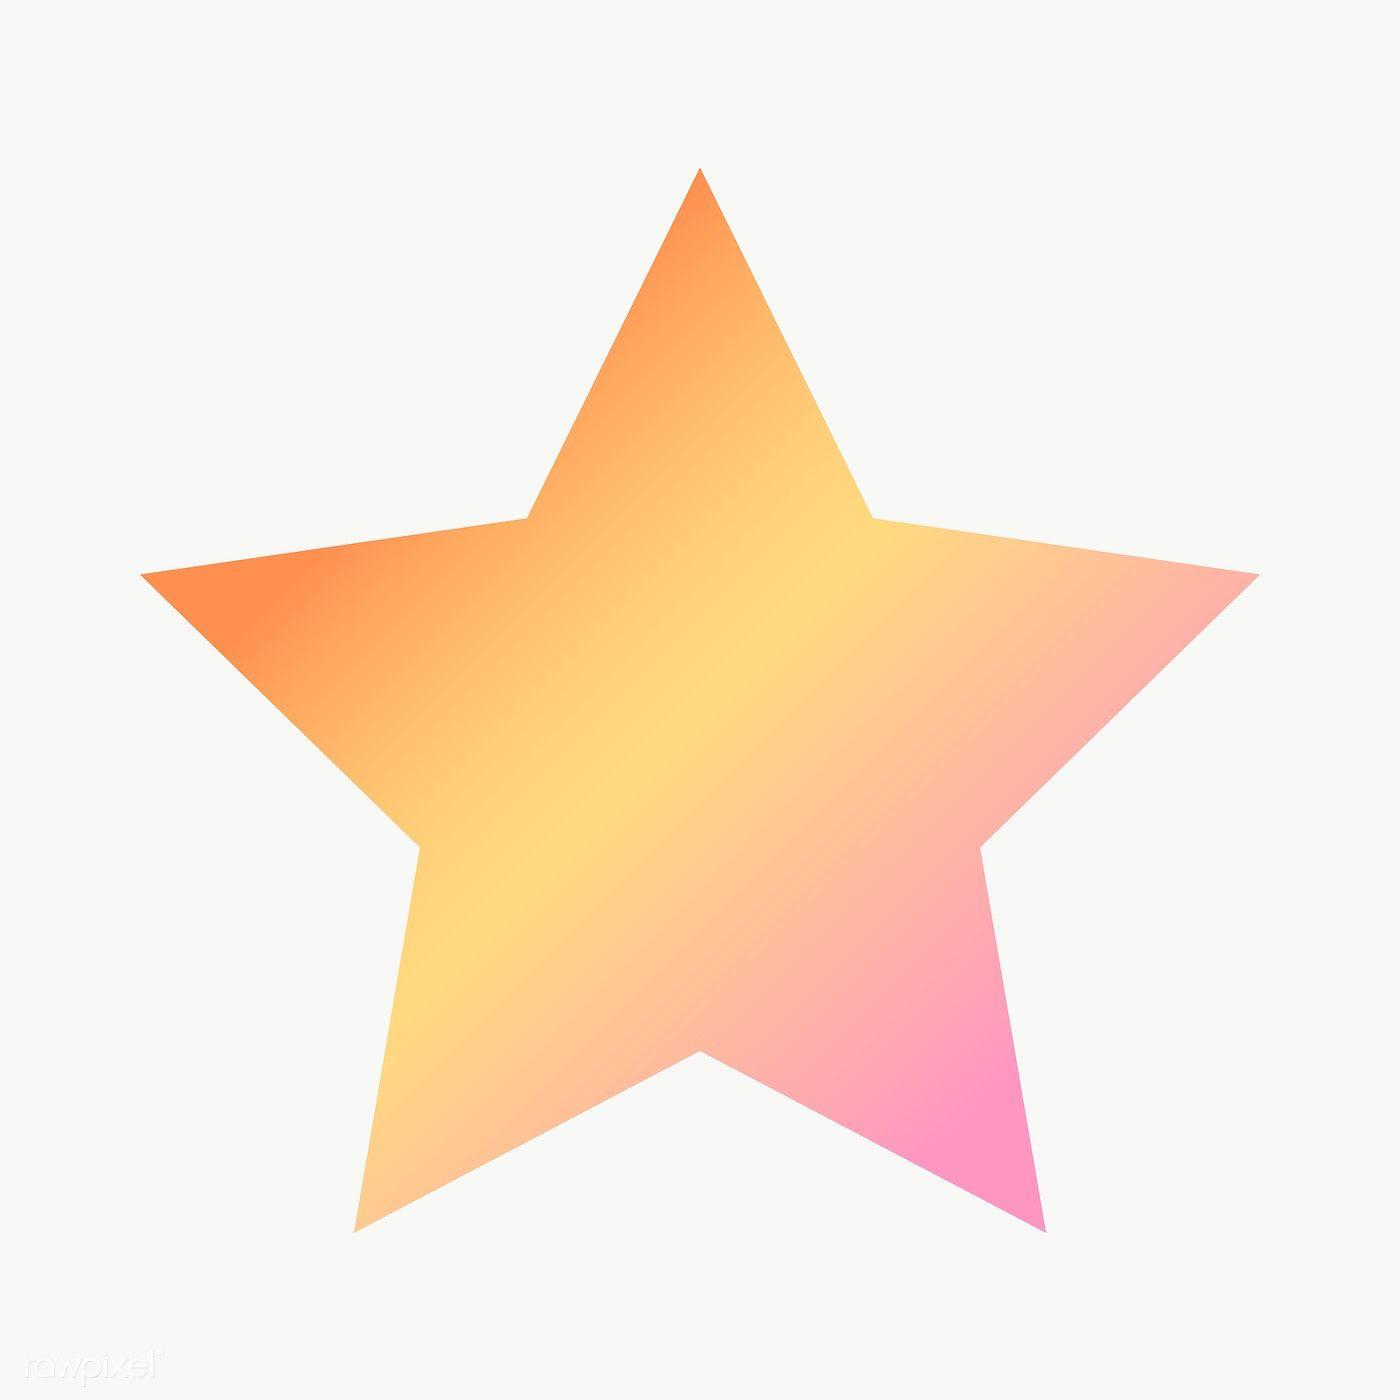 Orange Gradient Star Geometric Shape Transparent Png Free Image By Rawpixel Com Ningzk V Geometric Star Geometric Shapes Printable Designs